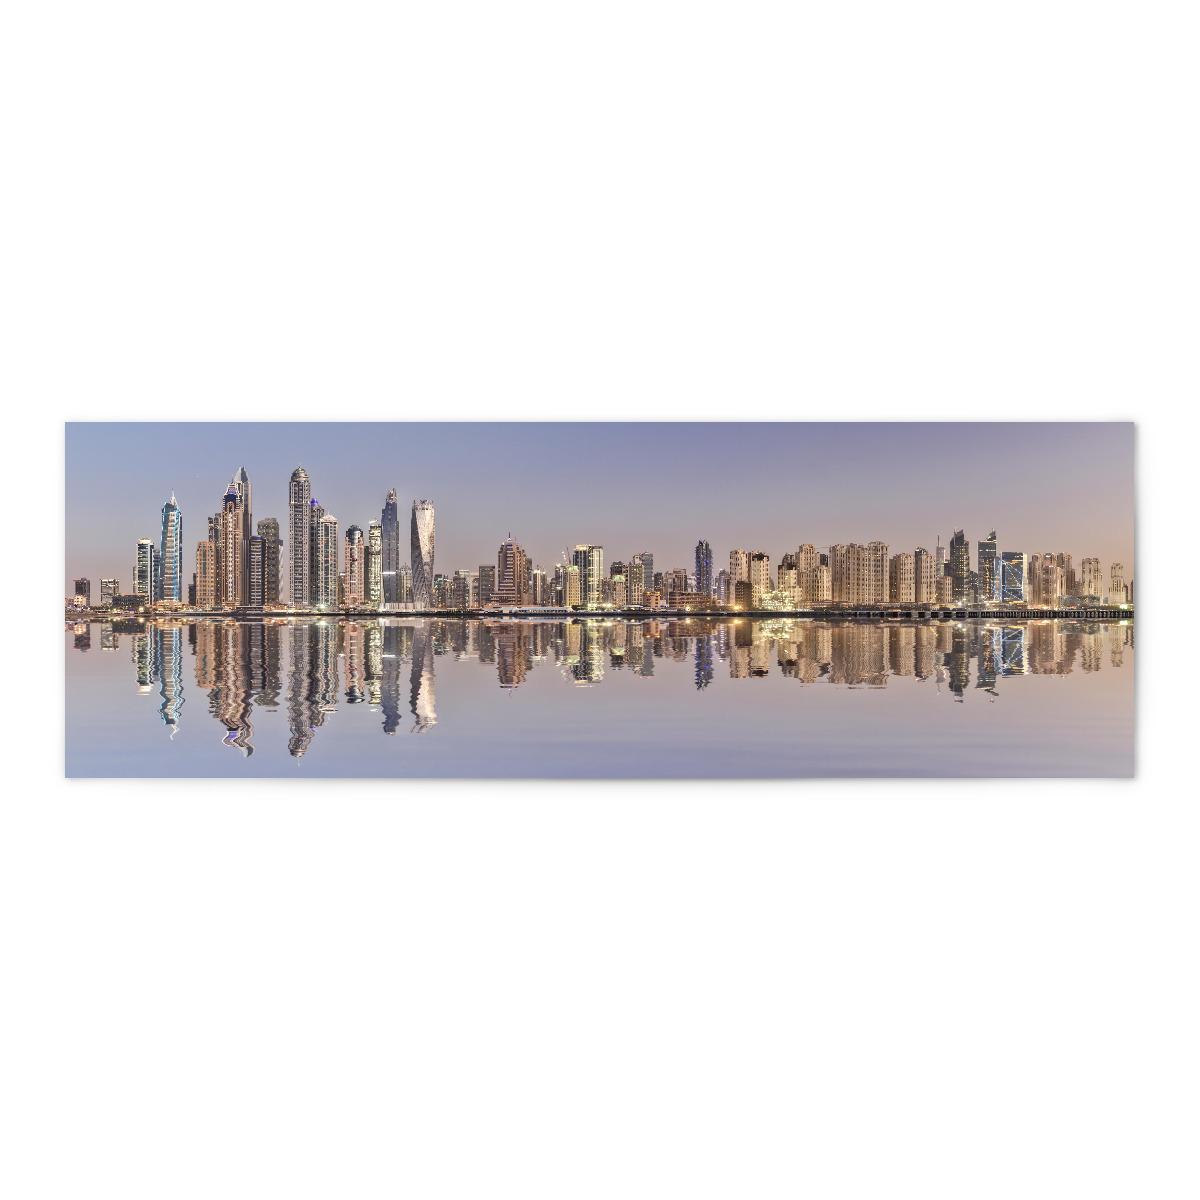 Wandfarbe Farbpalette Toom Eine Graue Farbpalette: Dubai Panorama Als Poster Bei ArtboxONE Kaufen